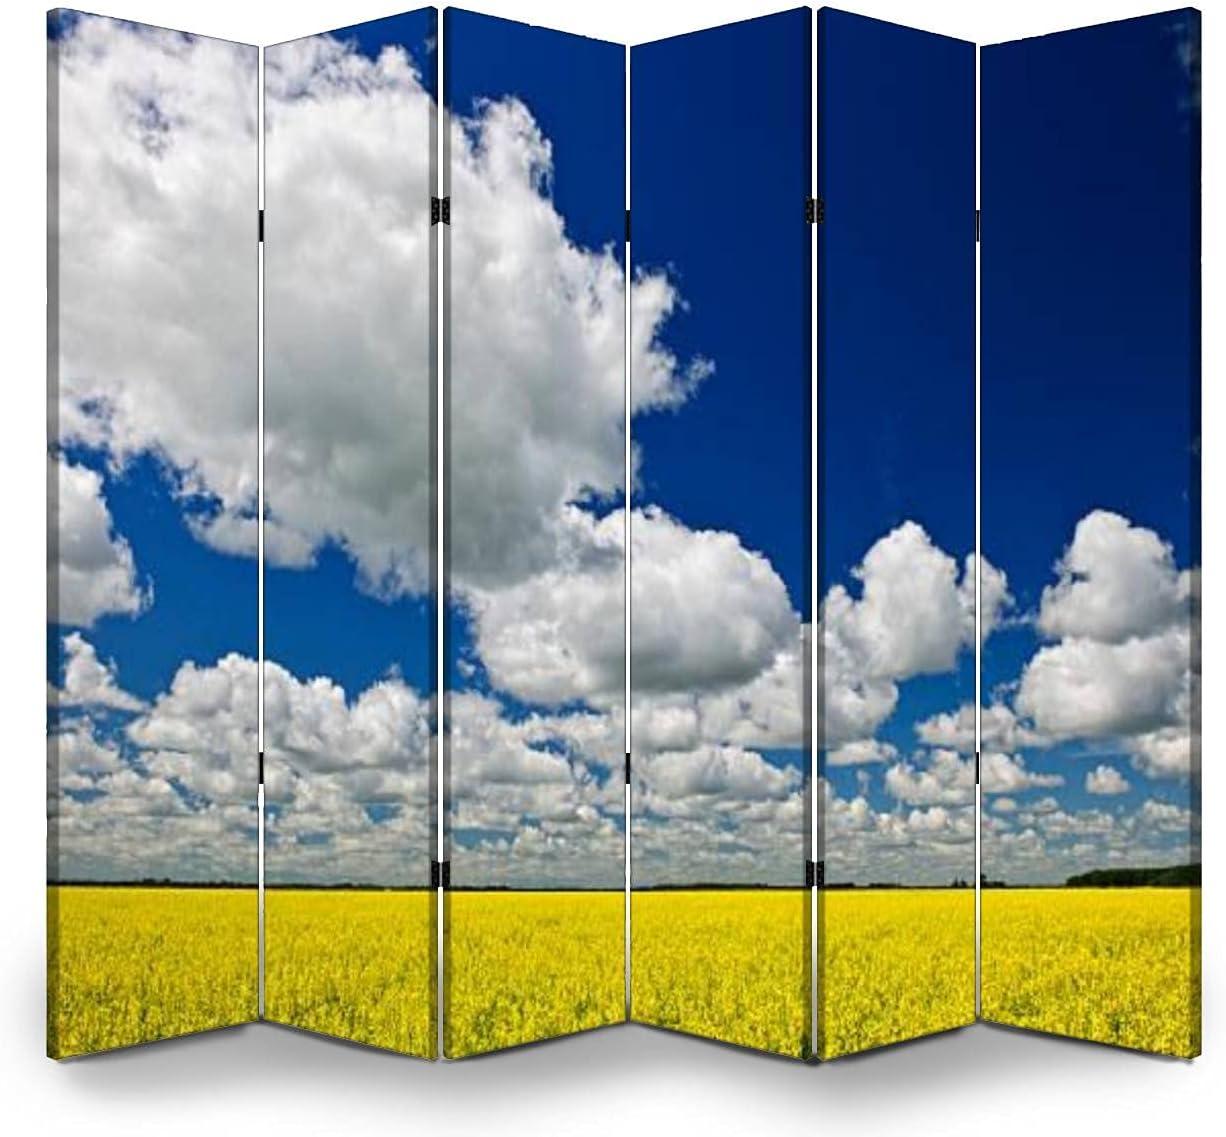 6 Panels Room Gifts Divider Screen Elegant Priv Partition Folding Field Canola